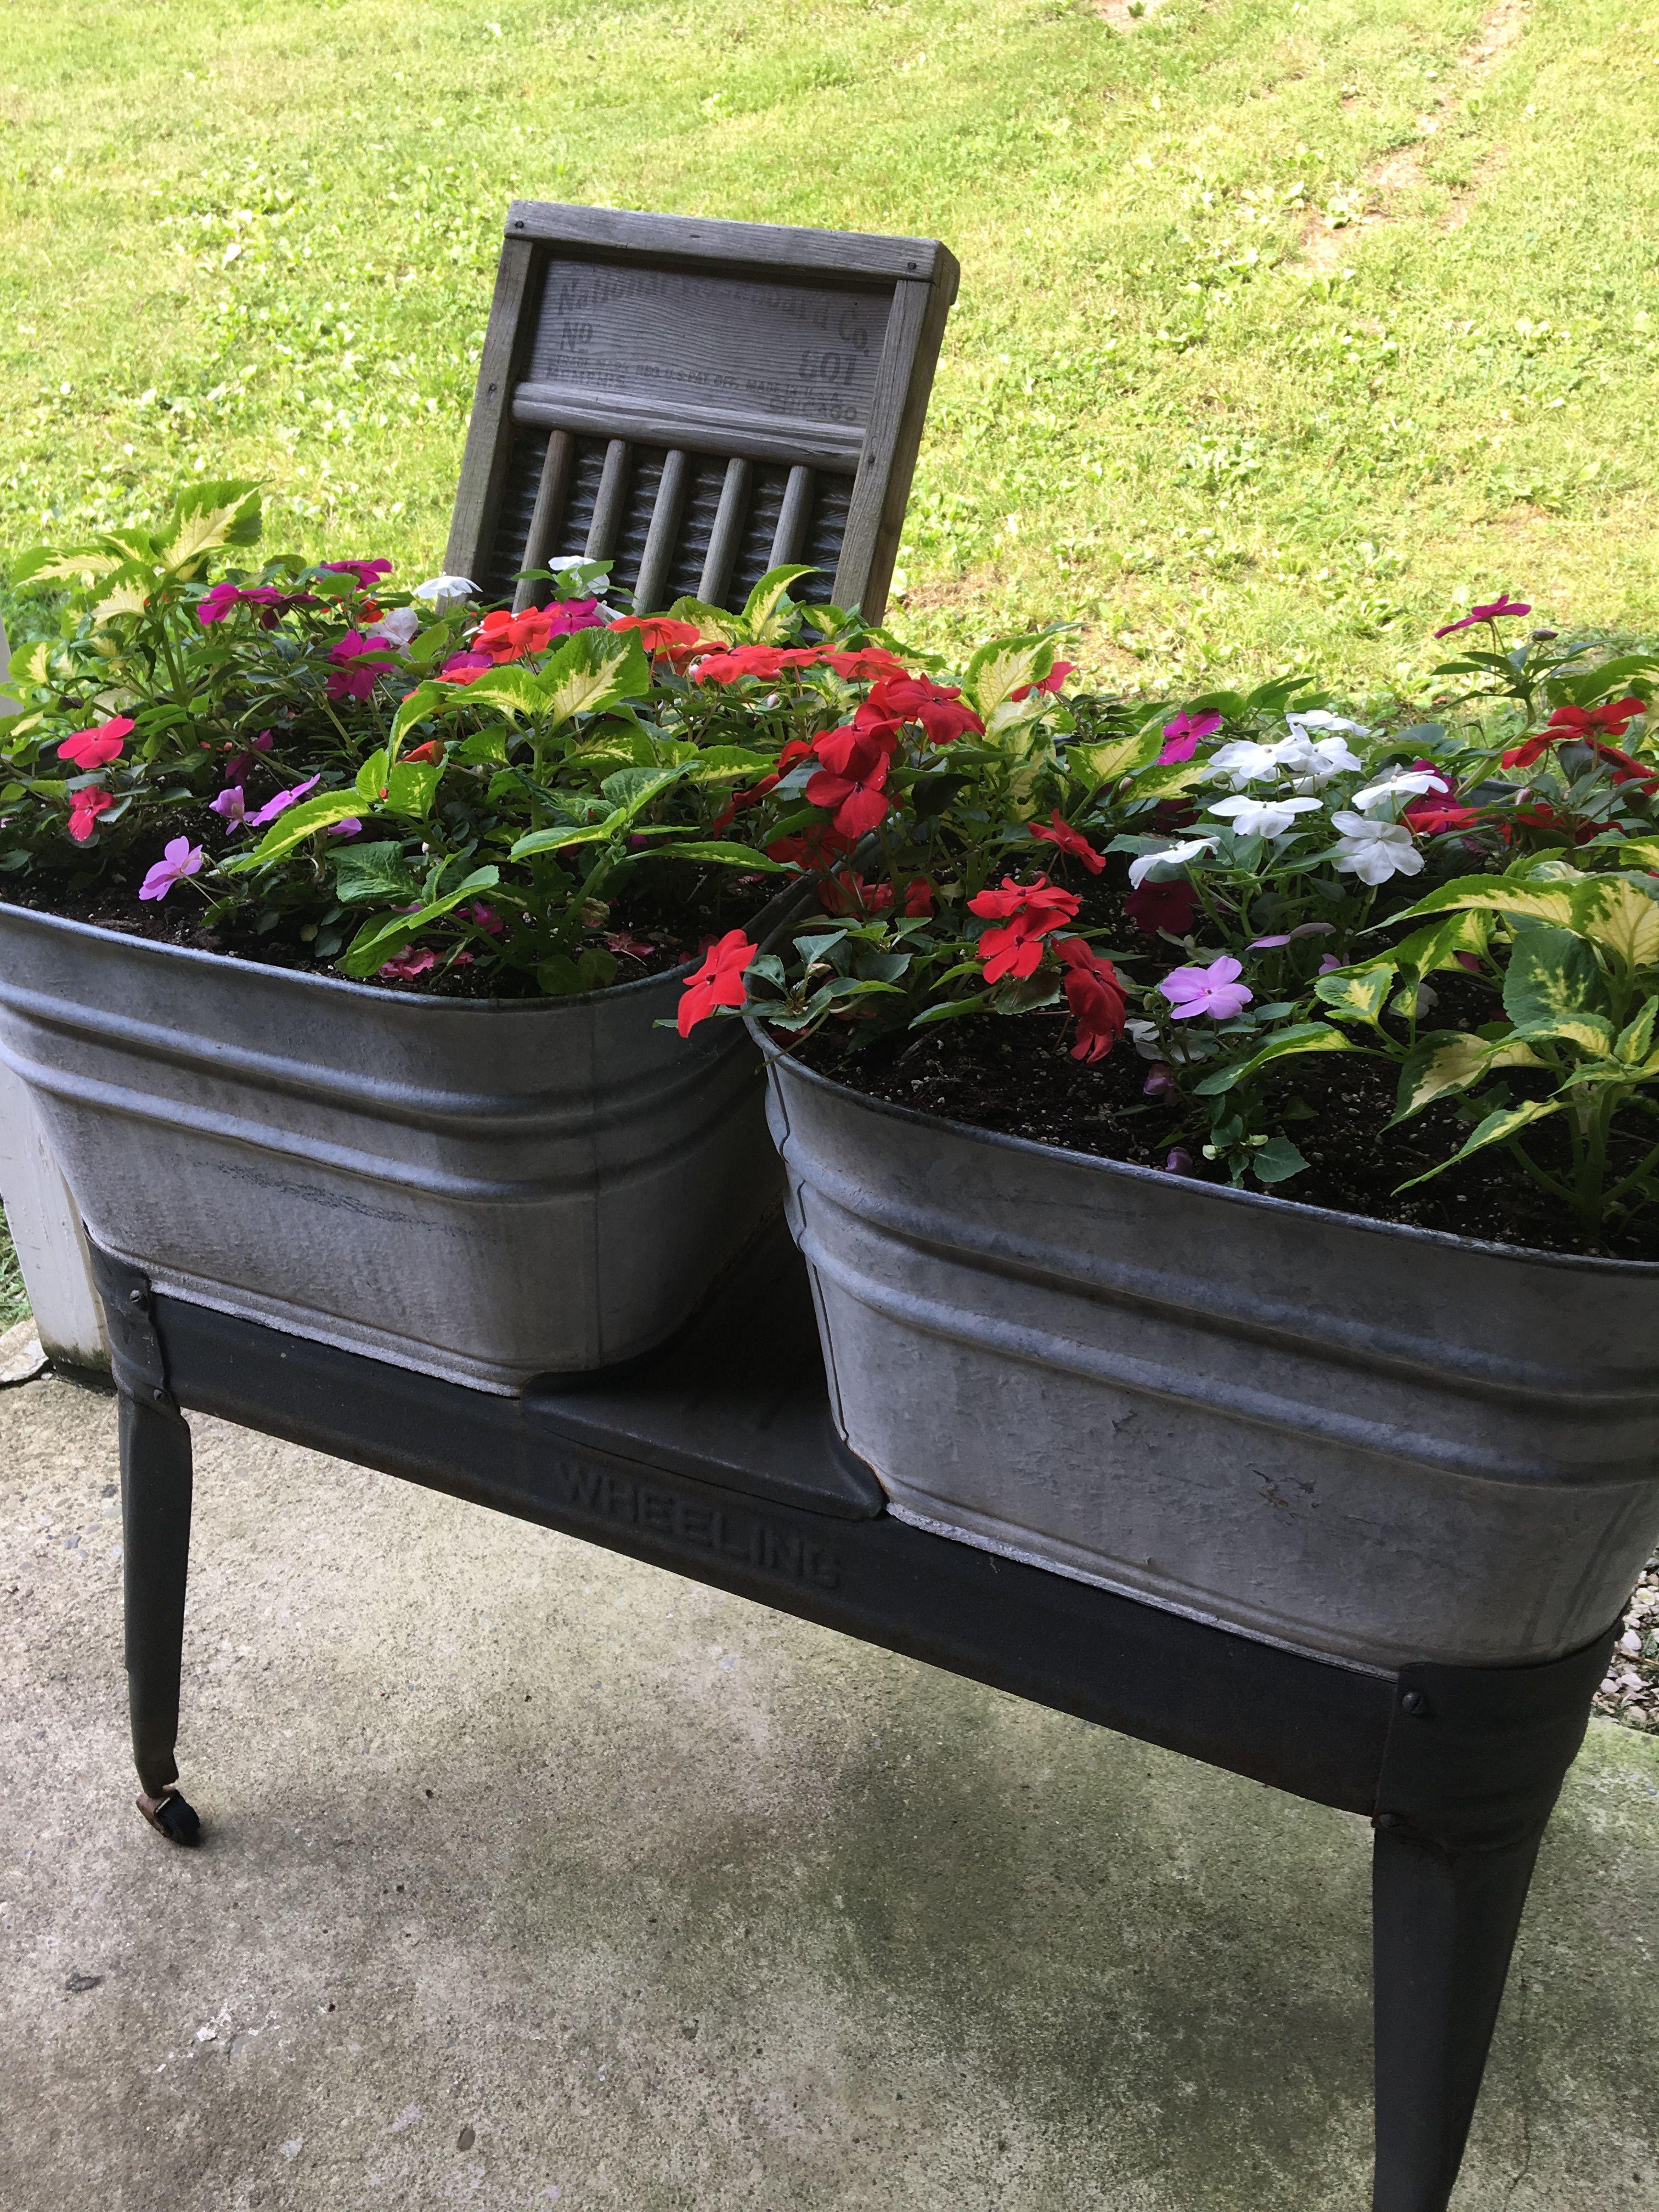 My Antique Washtub Planter June 2019 Vintage Sink Planters Outdoor Decor